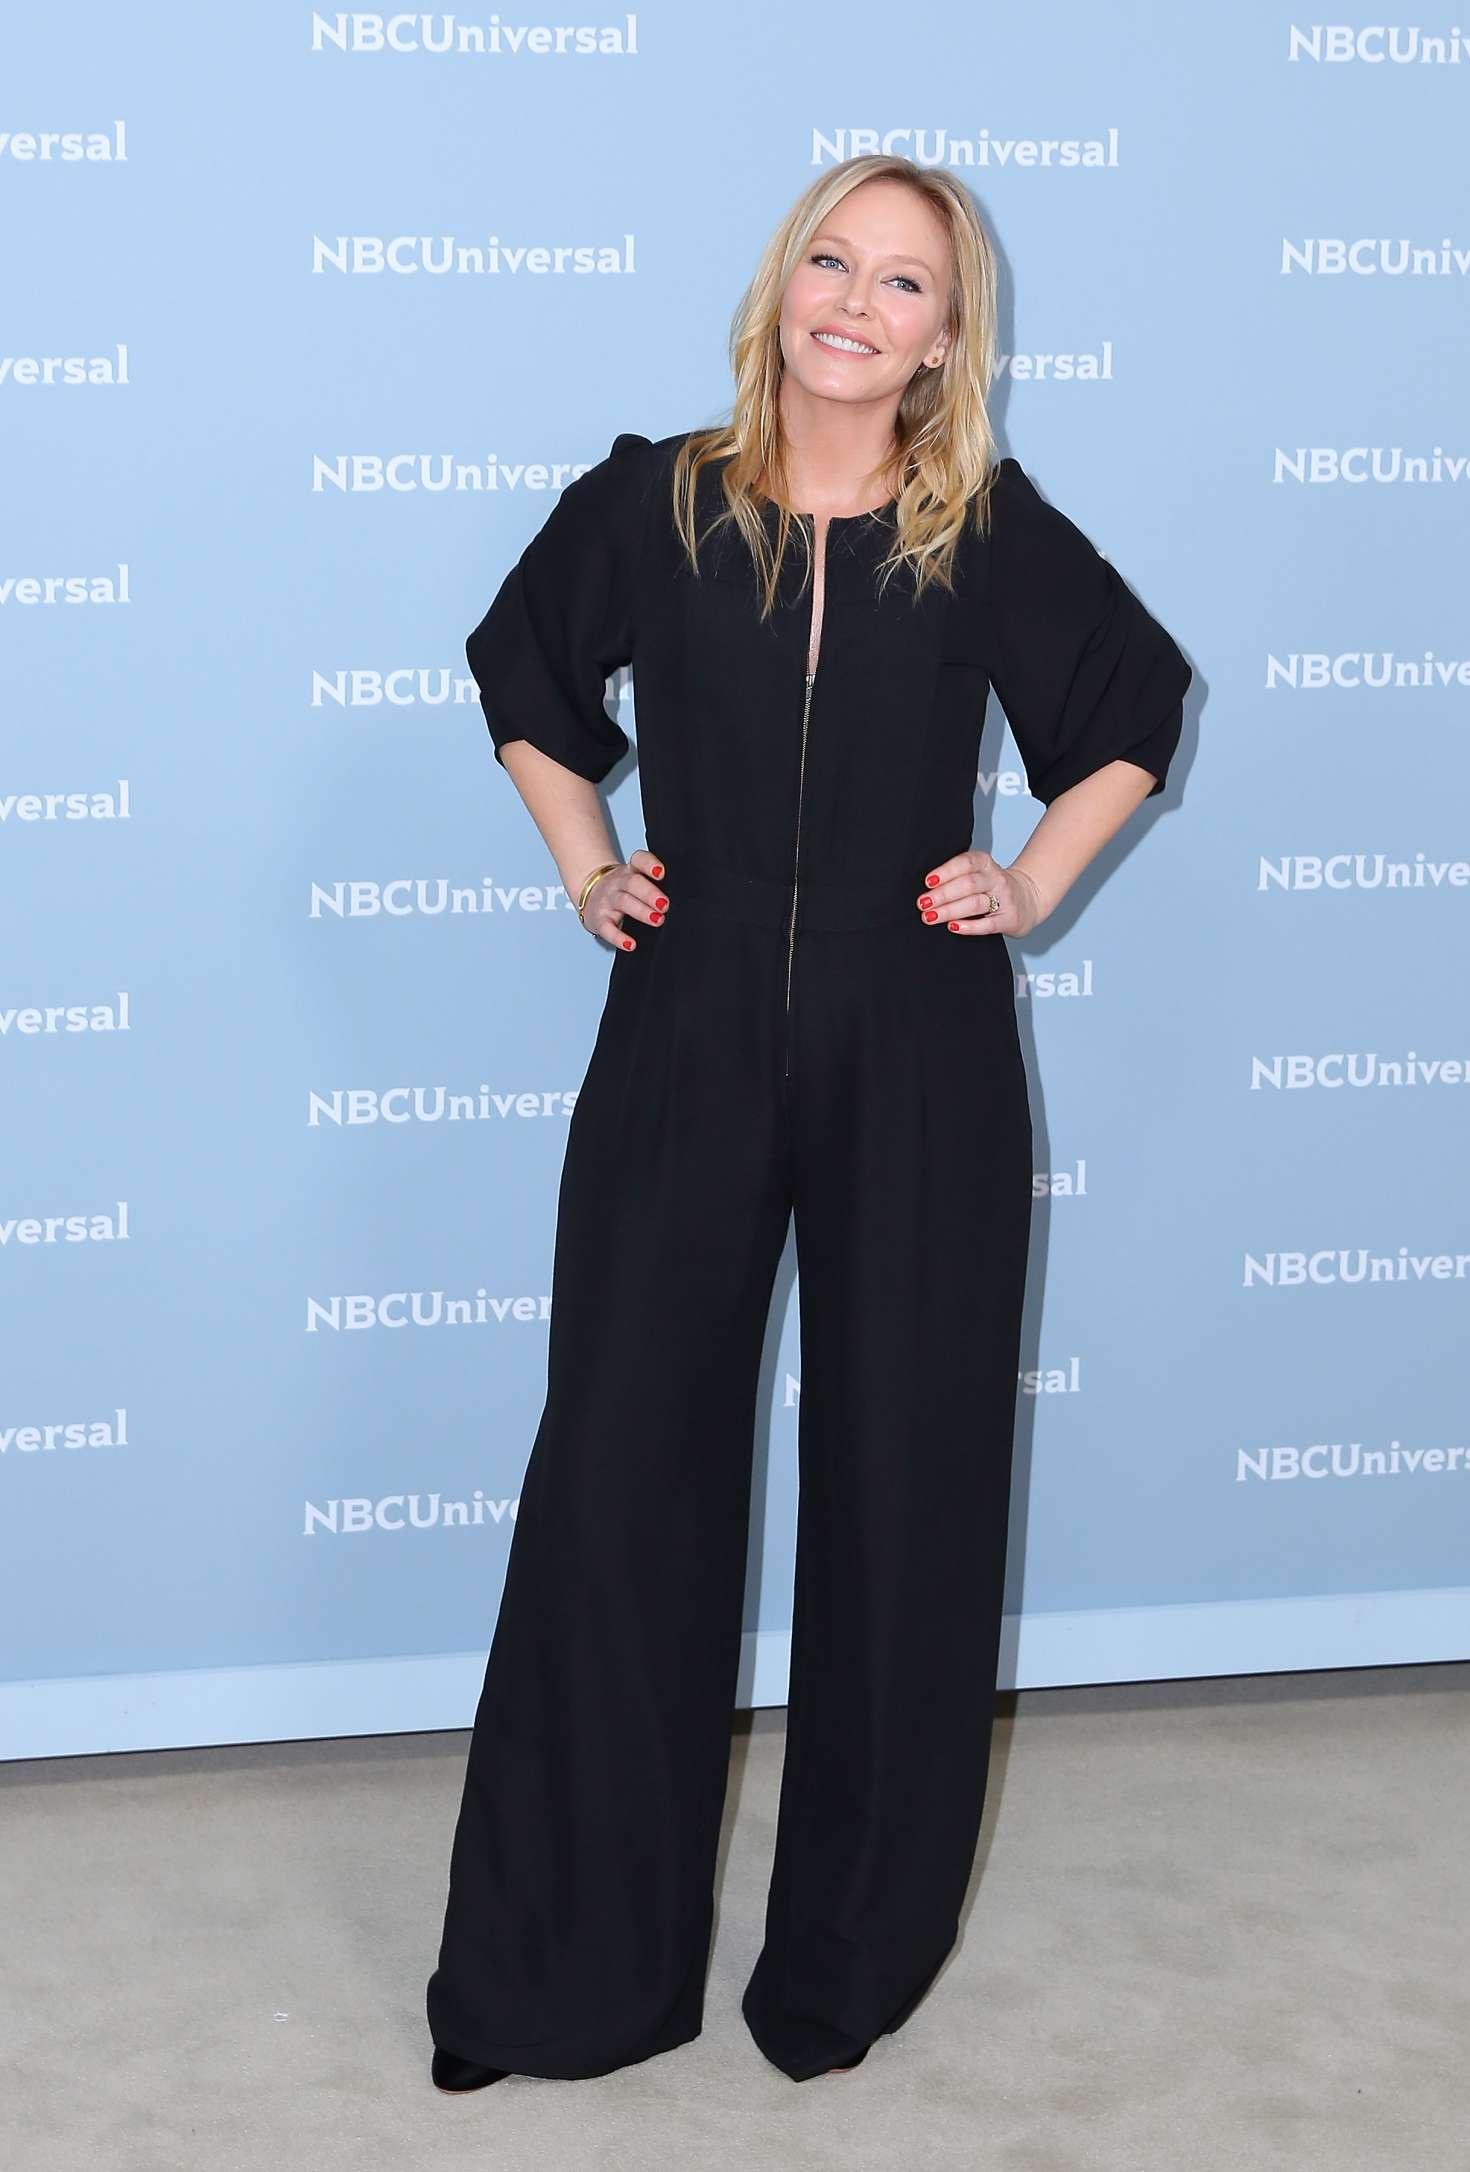 Kelli Giddish 2018 : Kelli Giddish: 2018 NBCUniversal Upfront Presentation -10